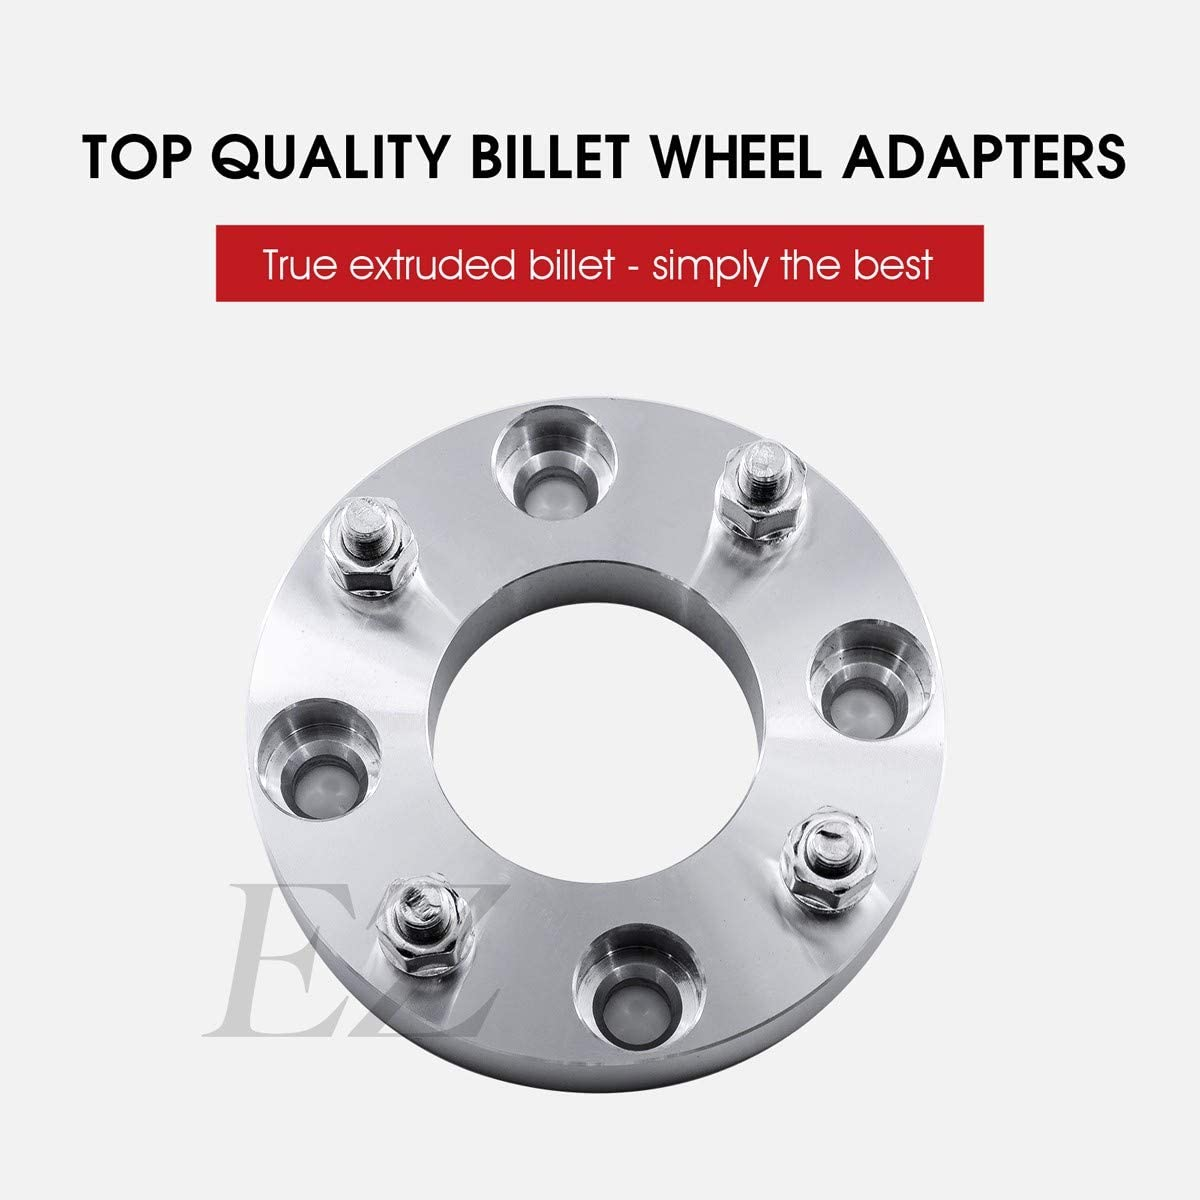 EZAccessory 2 ATV Wheel Adapters To Mount 4x110 Polaris Rims on 4x156 Yamaha Hub Thickness 2 Inch